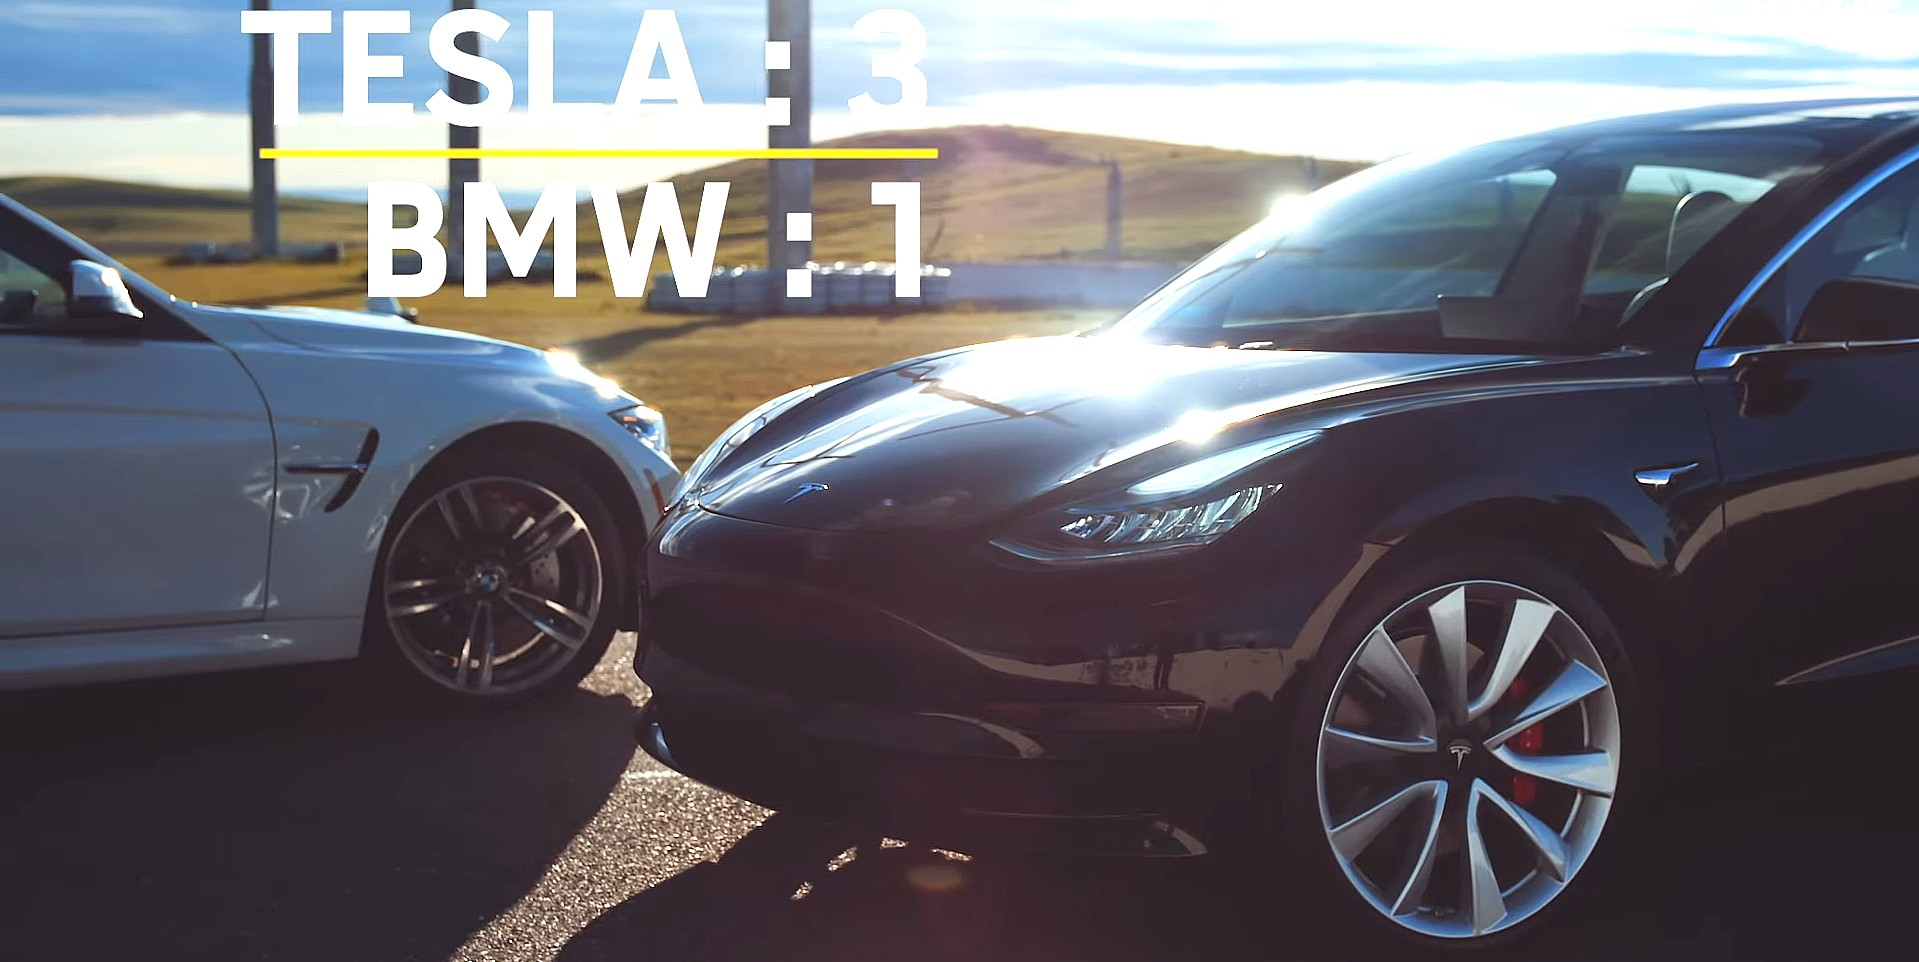 Watch Tesla S Model 3 Spank The Bmw M3 In Head To Head